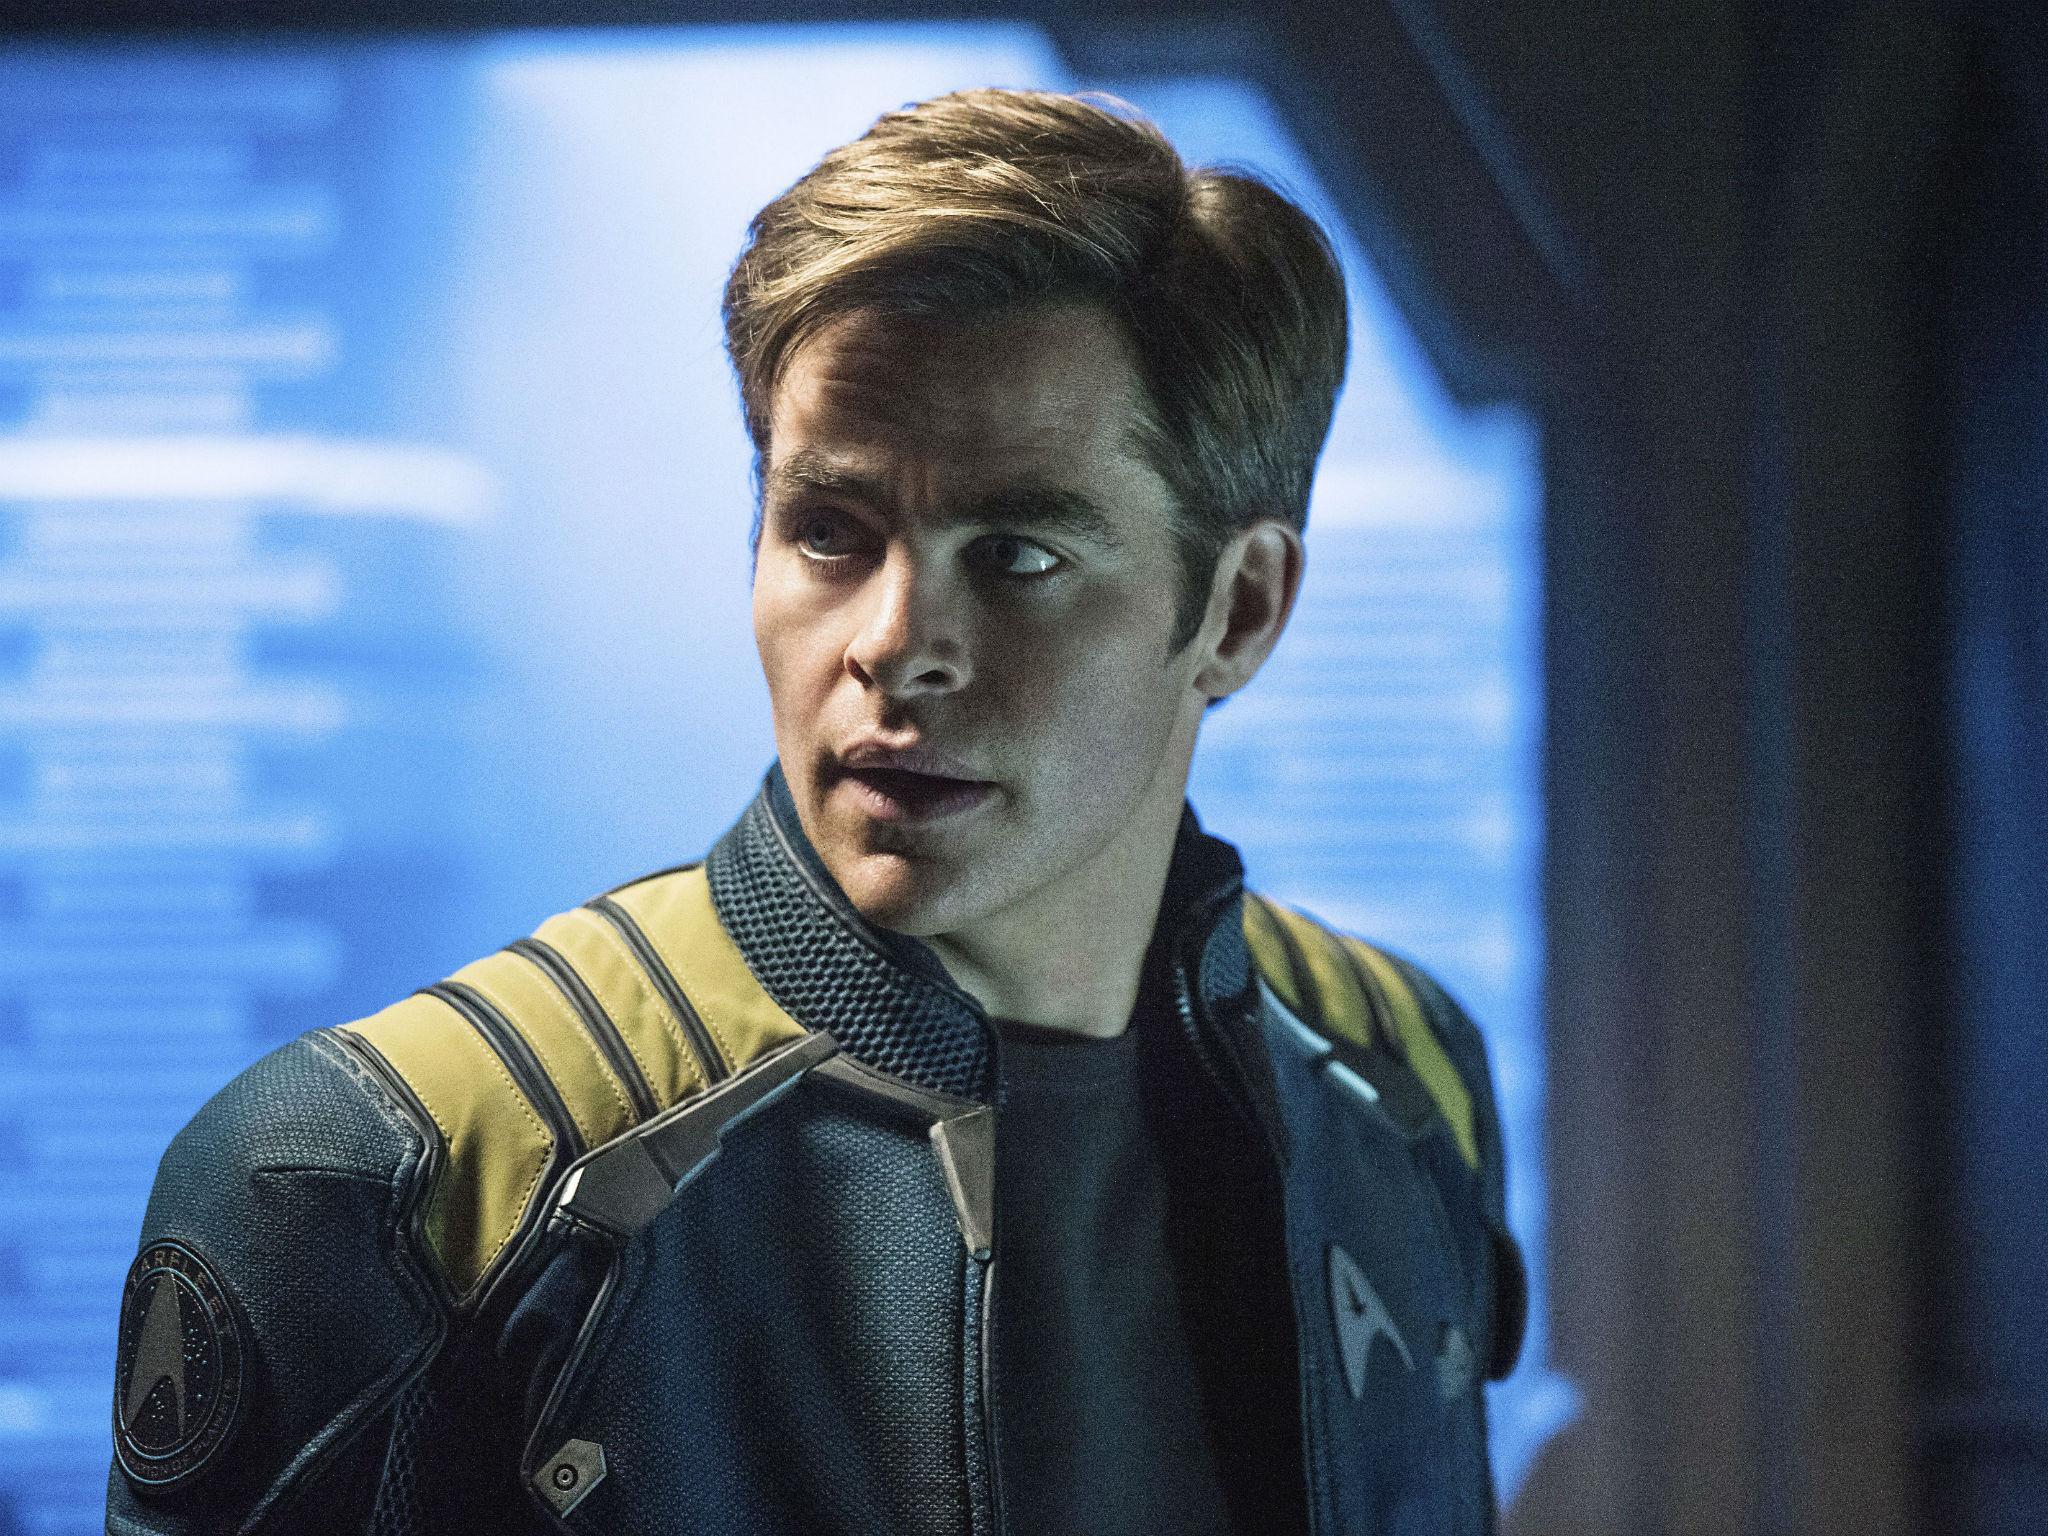 Star Trek 4: Chris Pine and Chris Hemsworth 'drop out' of film | The